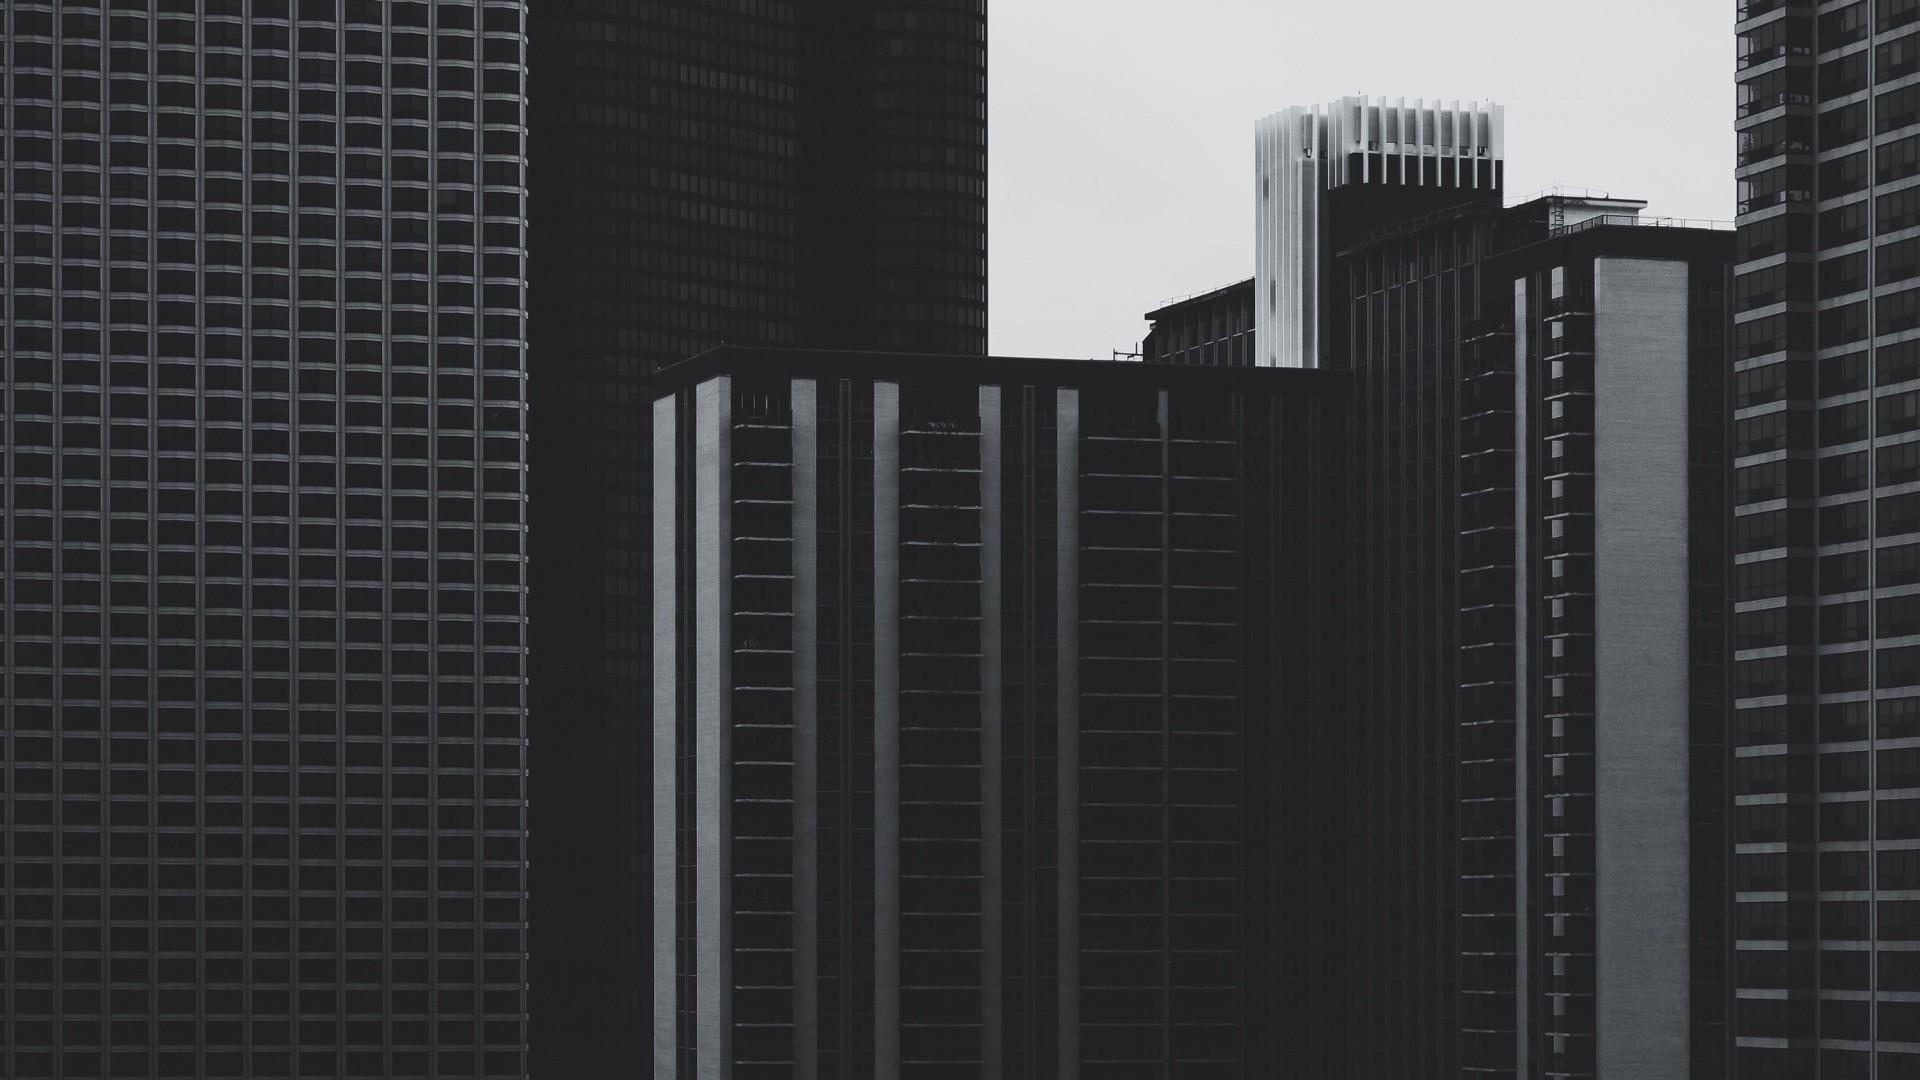 General 1920x1080 monochrome architecture building skyscraper photography minimalism urban window